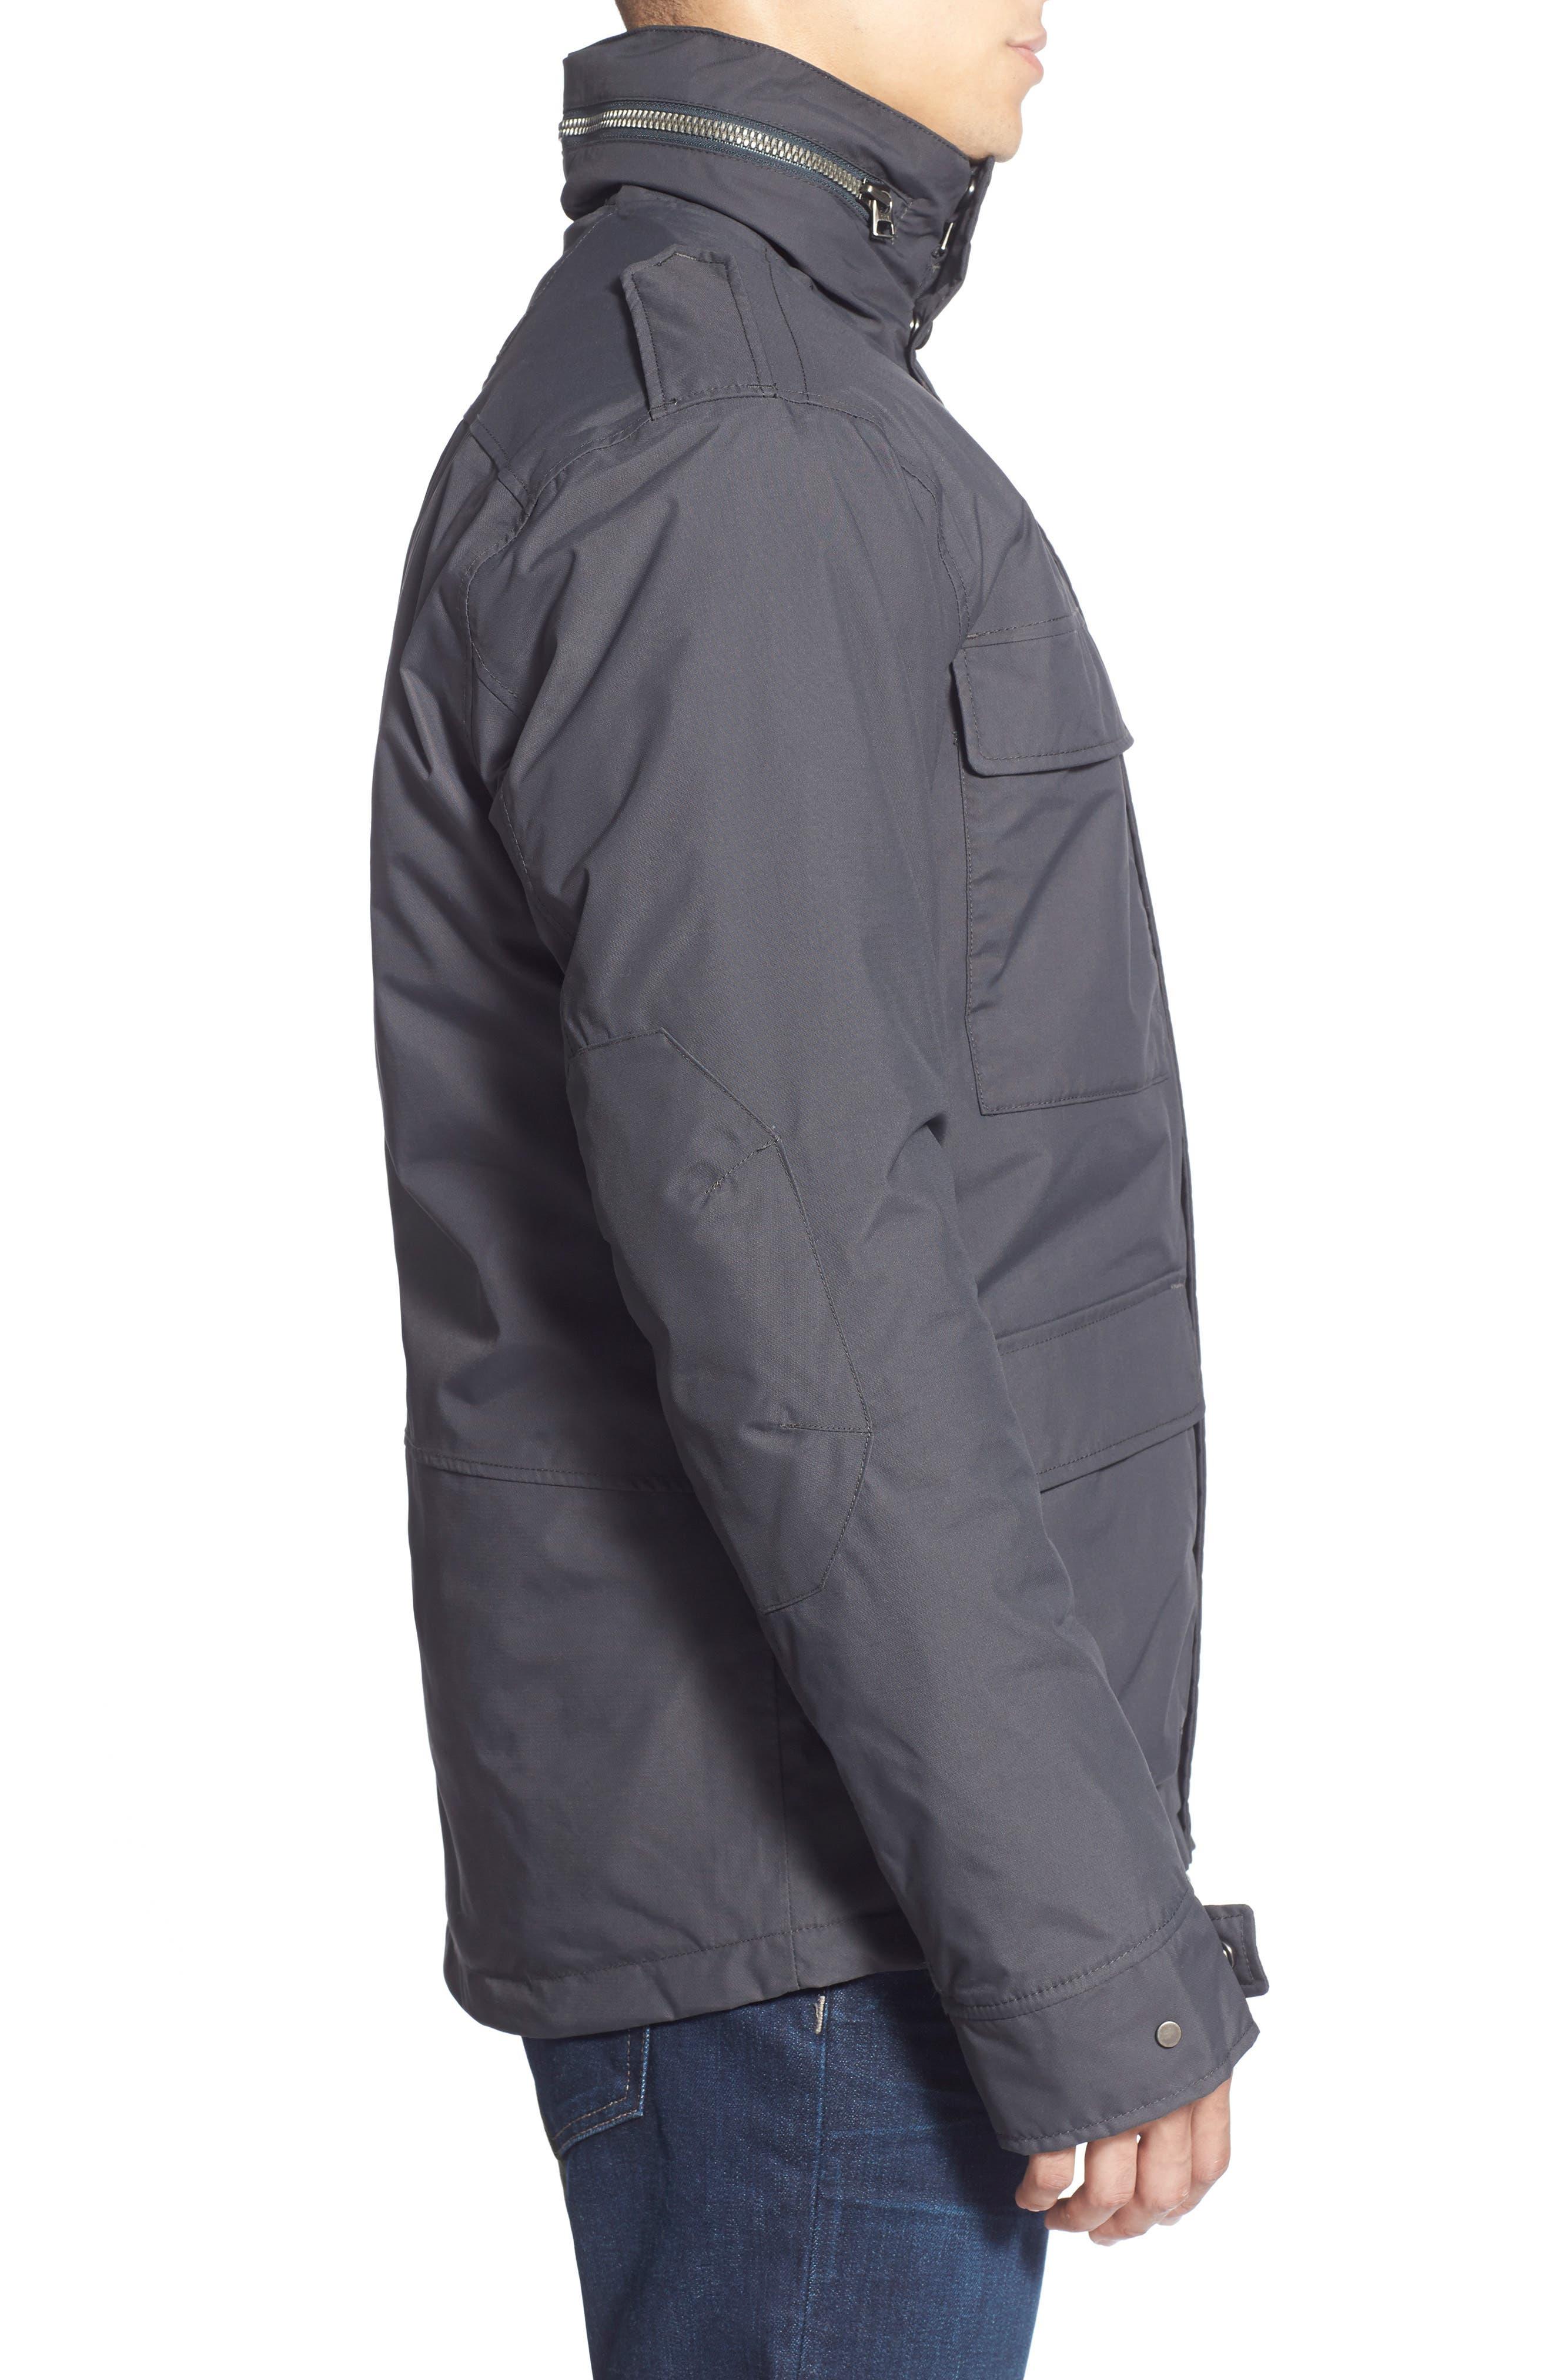 HellyHansen 'Universal' MotoRain Jacket,                             Alternate thumbnail 3, color,                             080